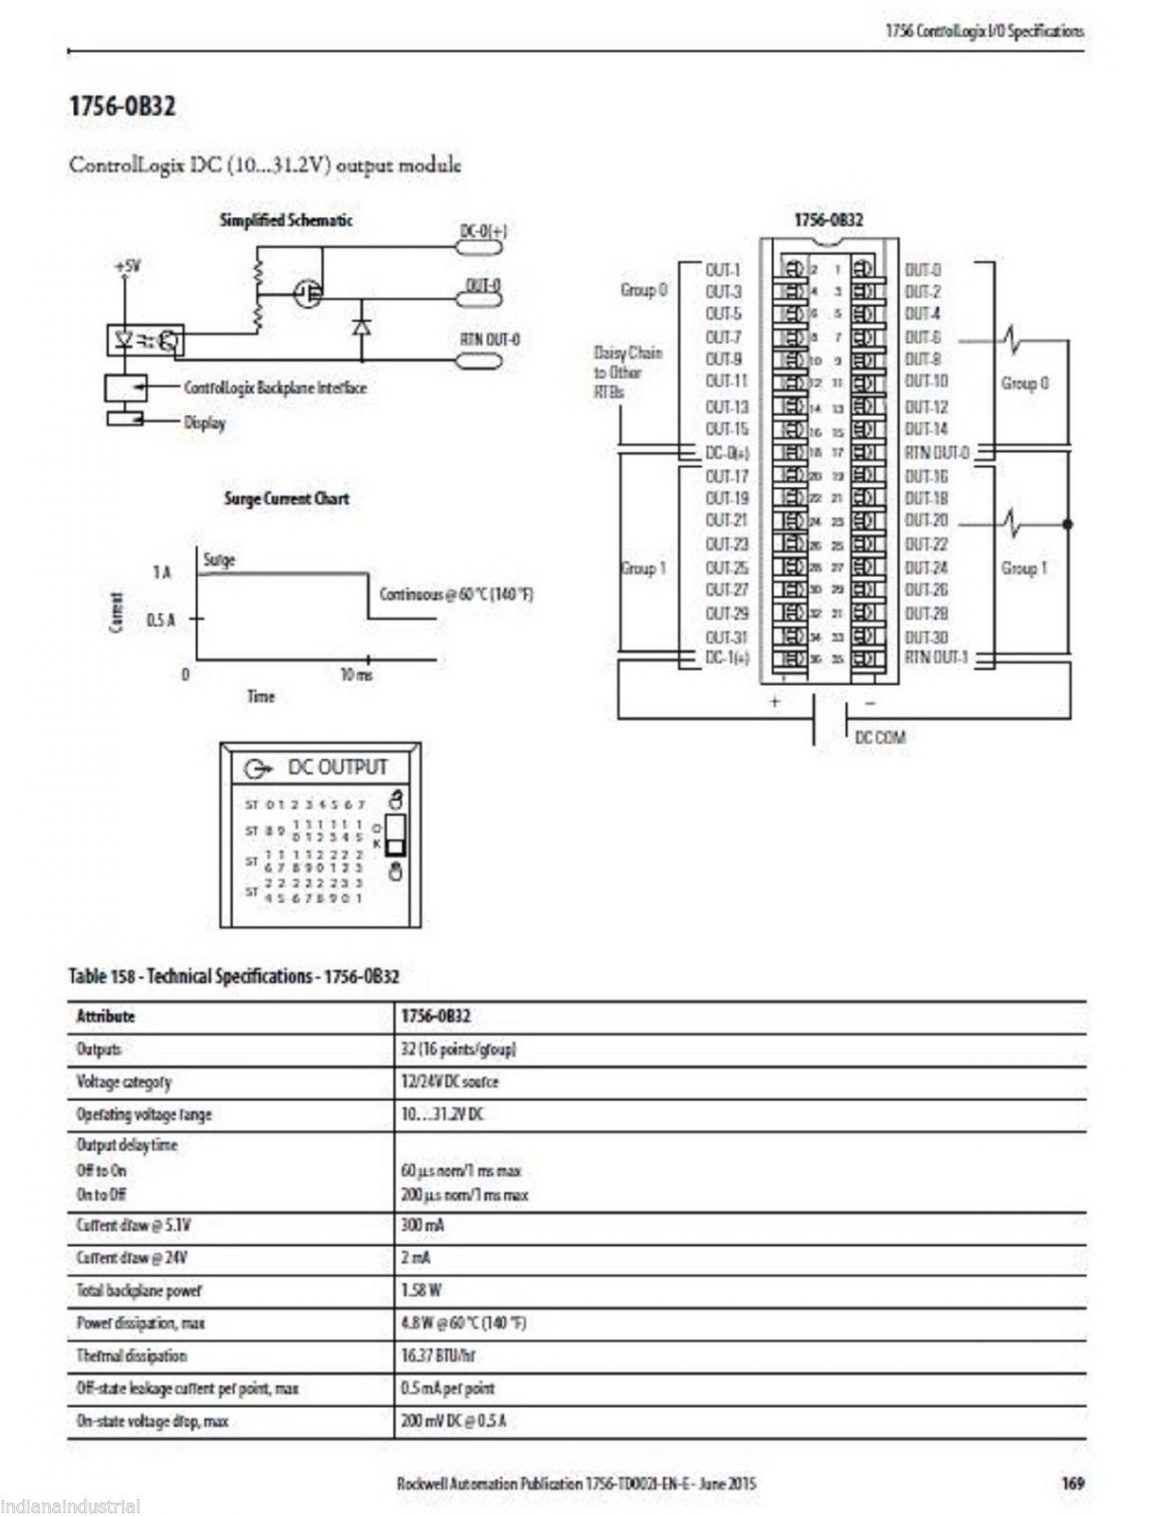 Allen dley Wiring Diagram - Wiring Diagrams on